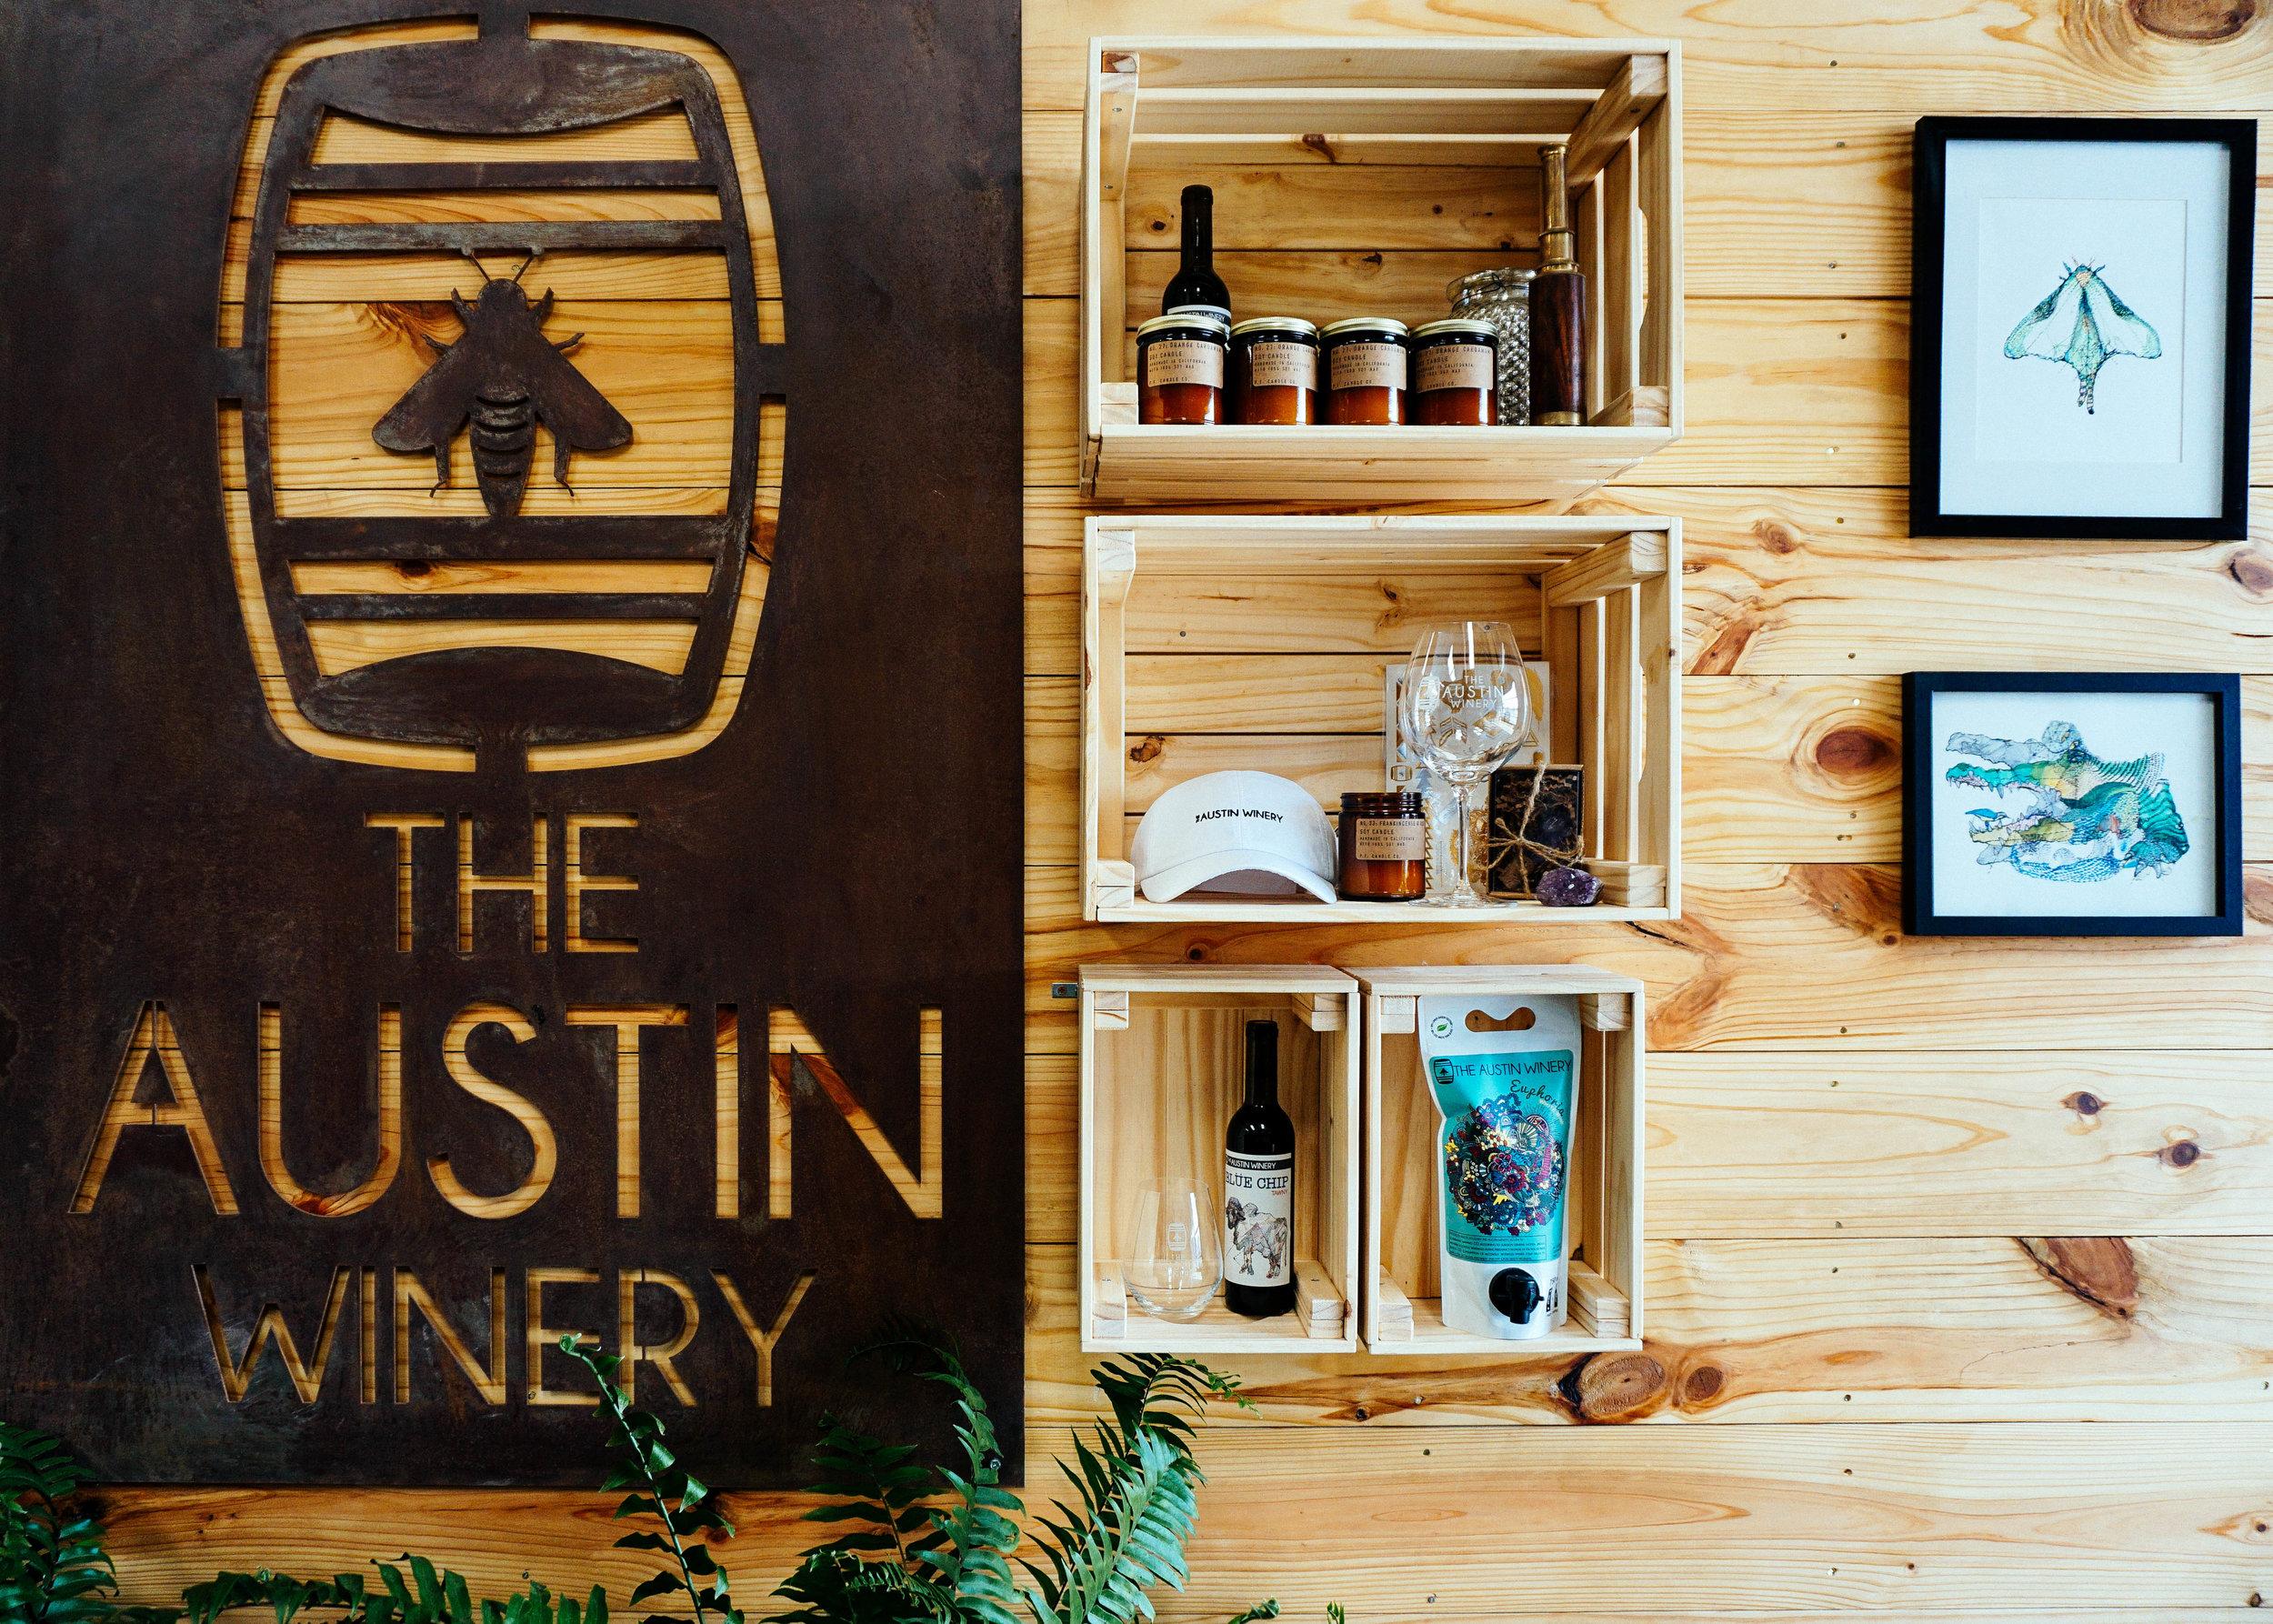 AustinWinery4 - credit Amadeo Garcia.jpg